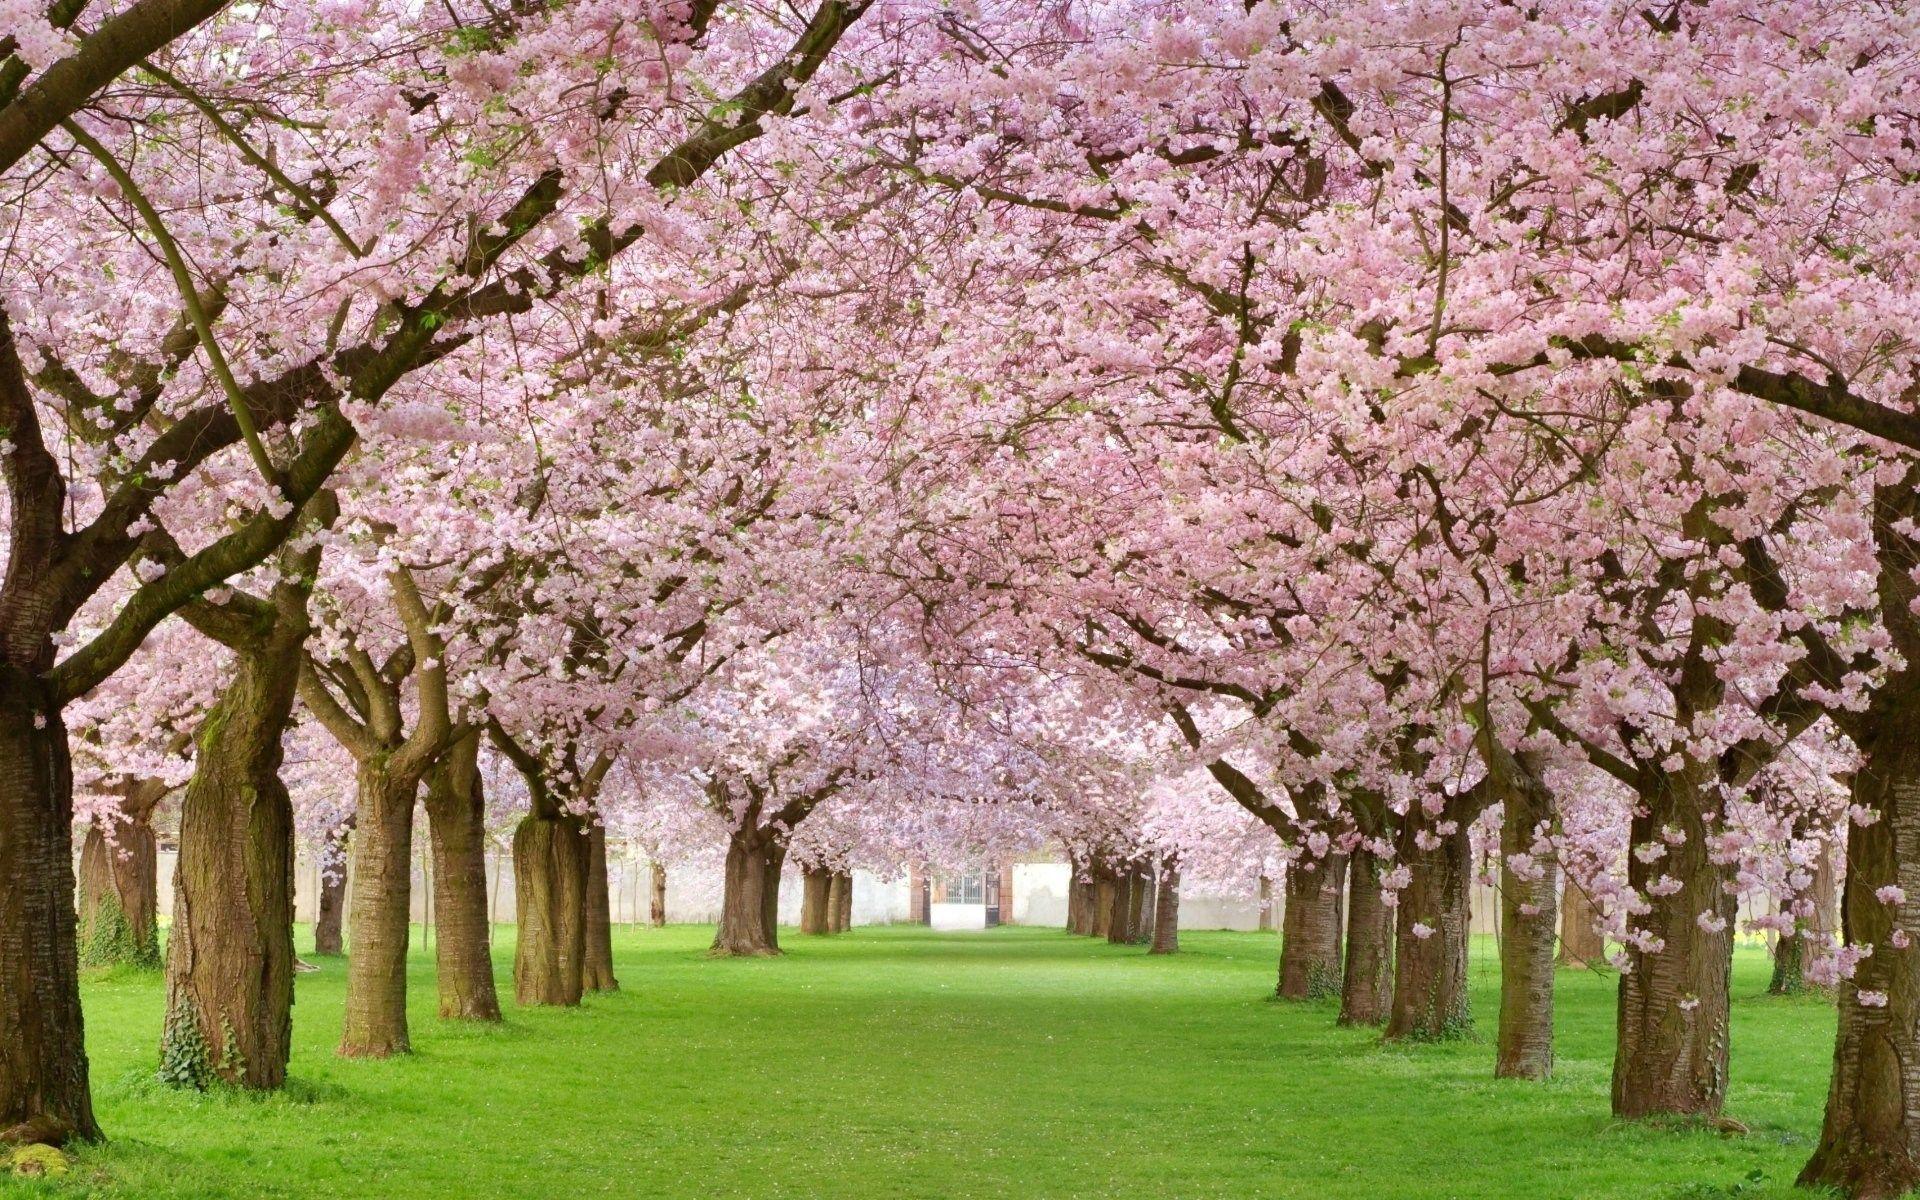 Cherry Blossom Widescreen Backgrounds